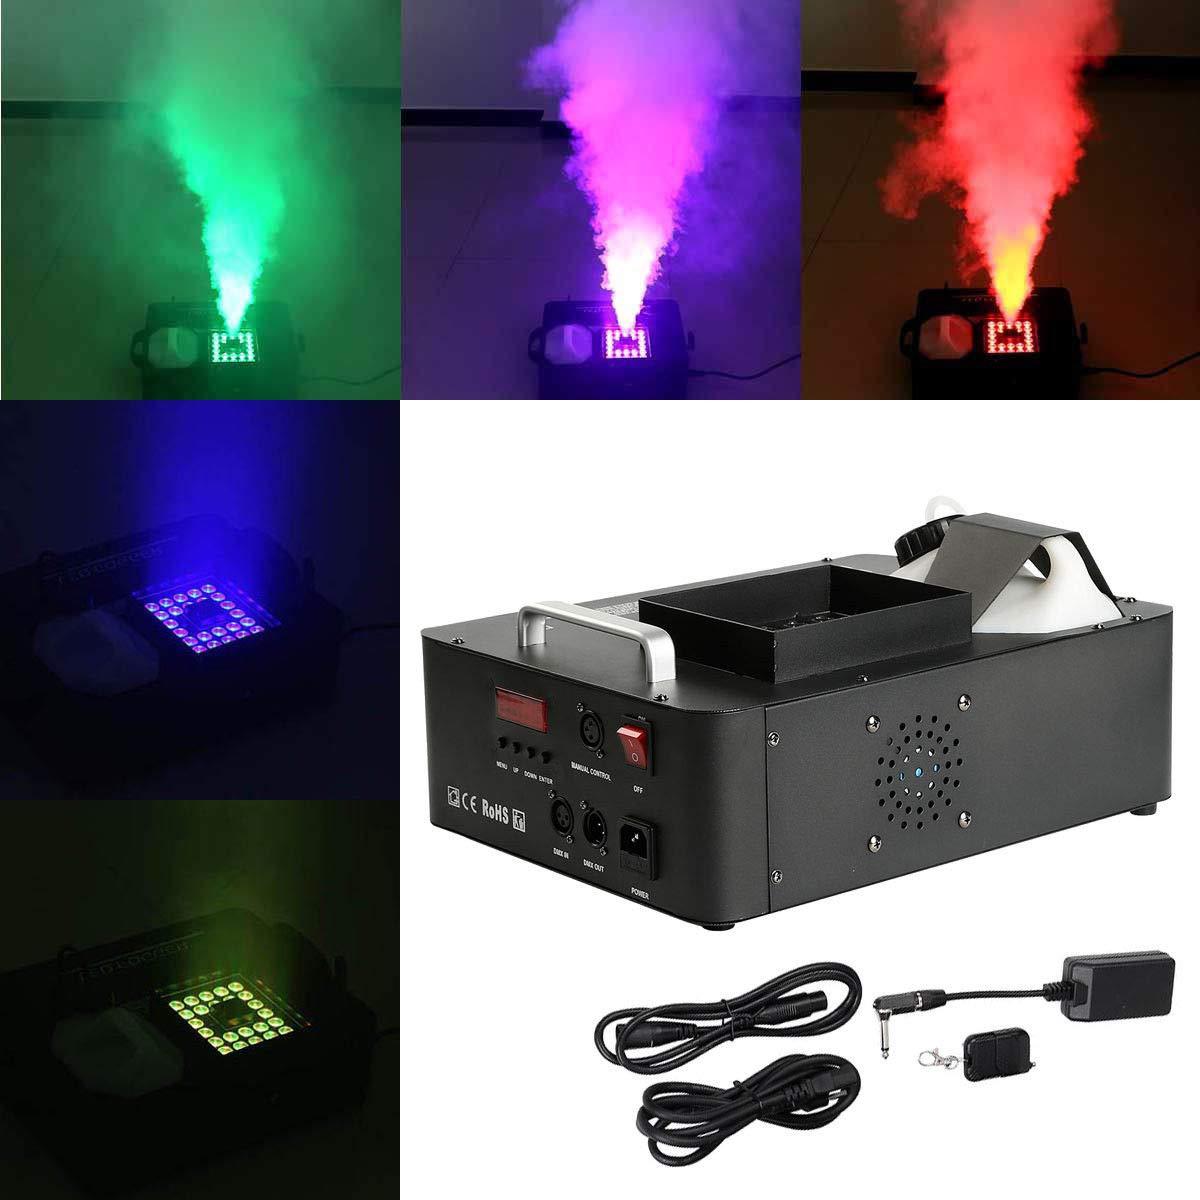 Tengchang RGB 3 in1 24 LED DMX Fog Smoke Machine Stage Lighting Vertical Spray W/Remote